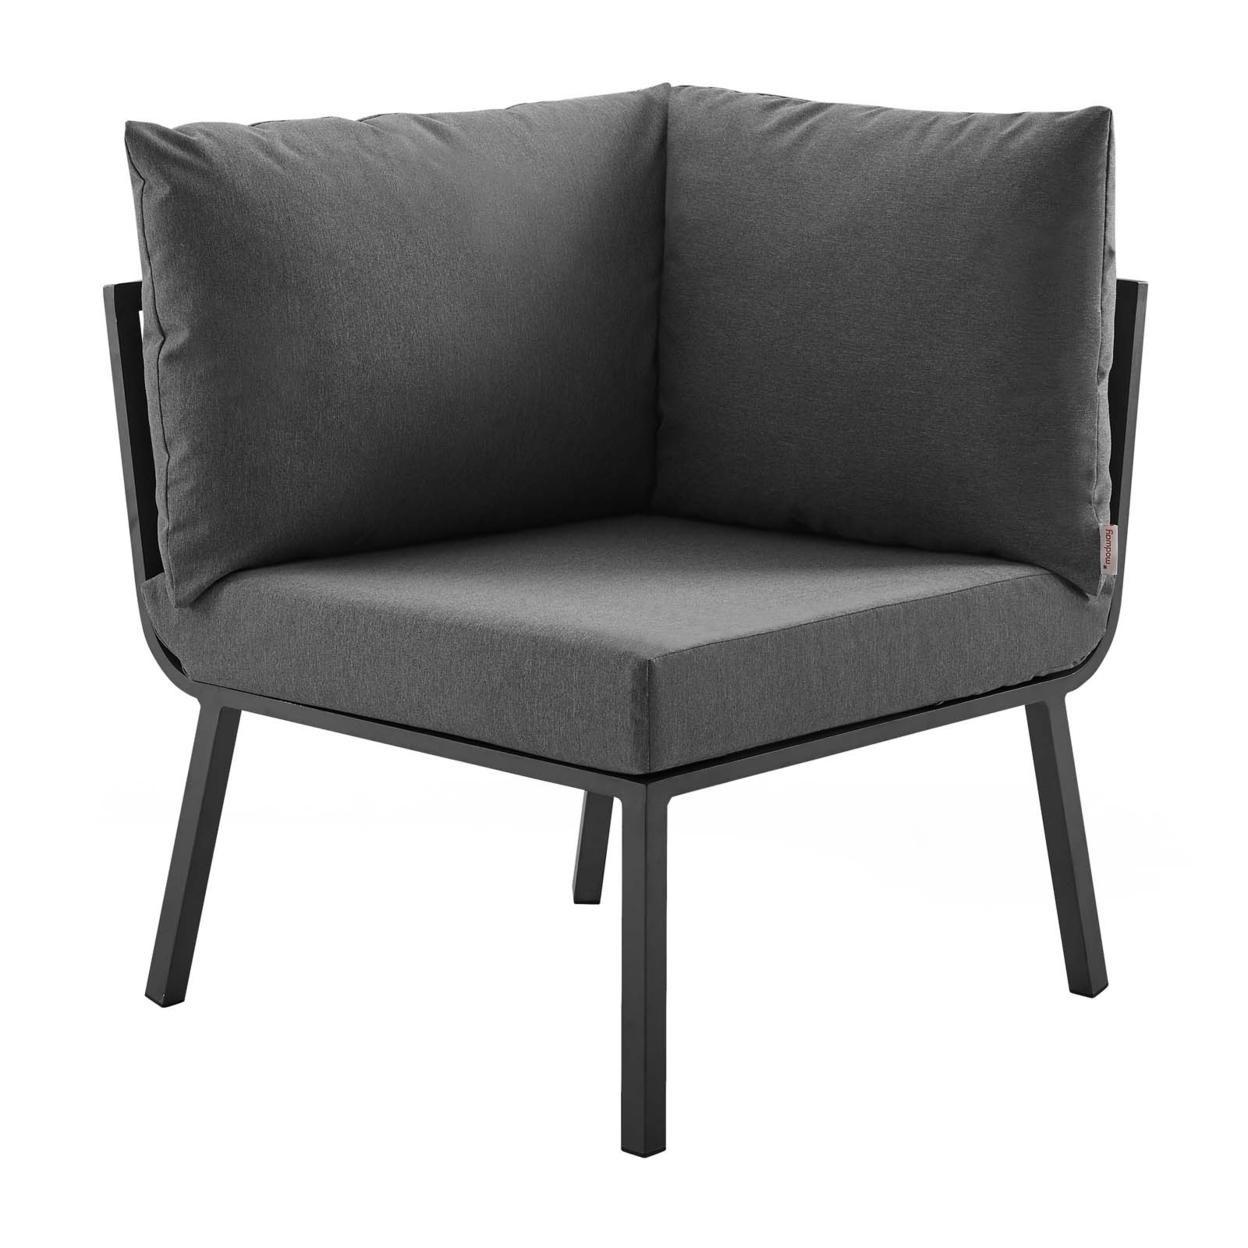 Riverside 2 Piece Outdoor Patio Aluminum Sectional Sofa Set, Gray Charcoal